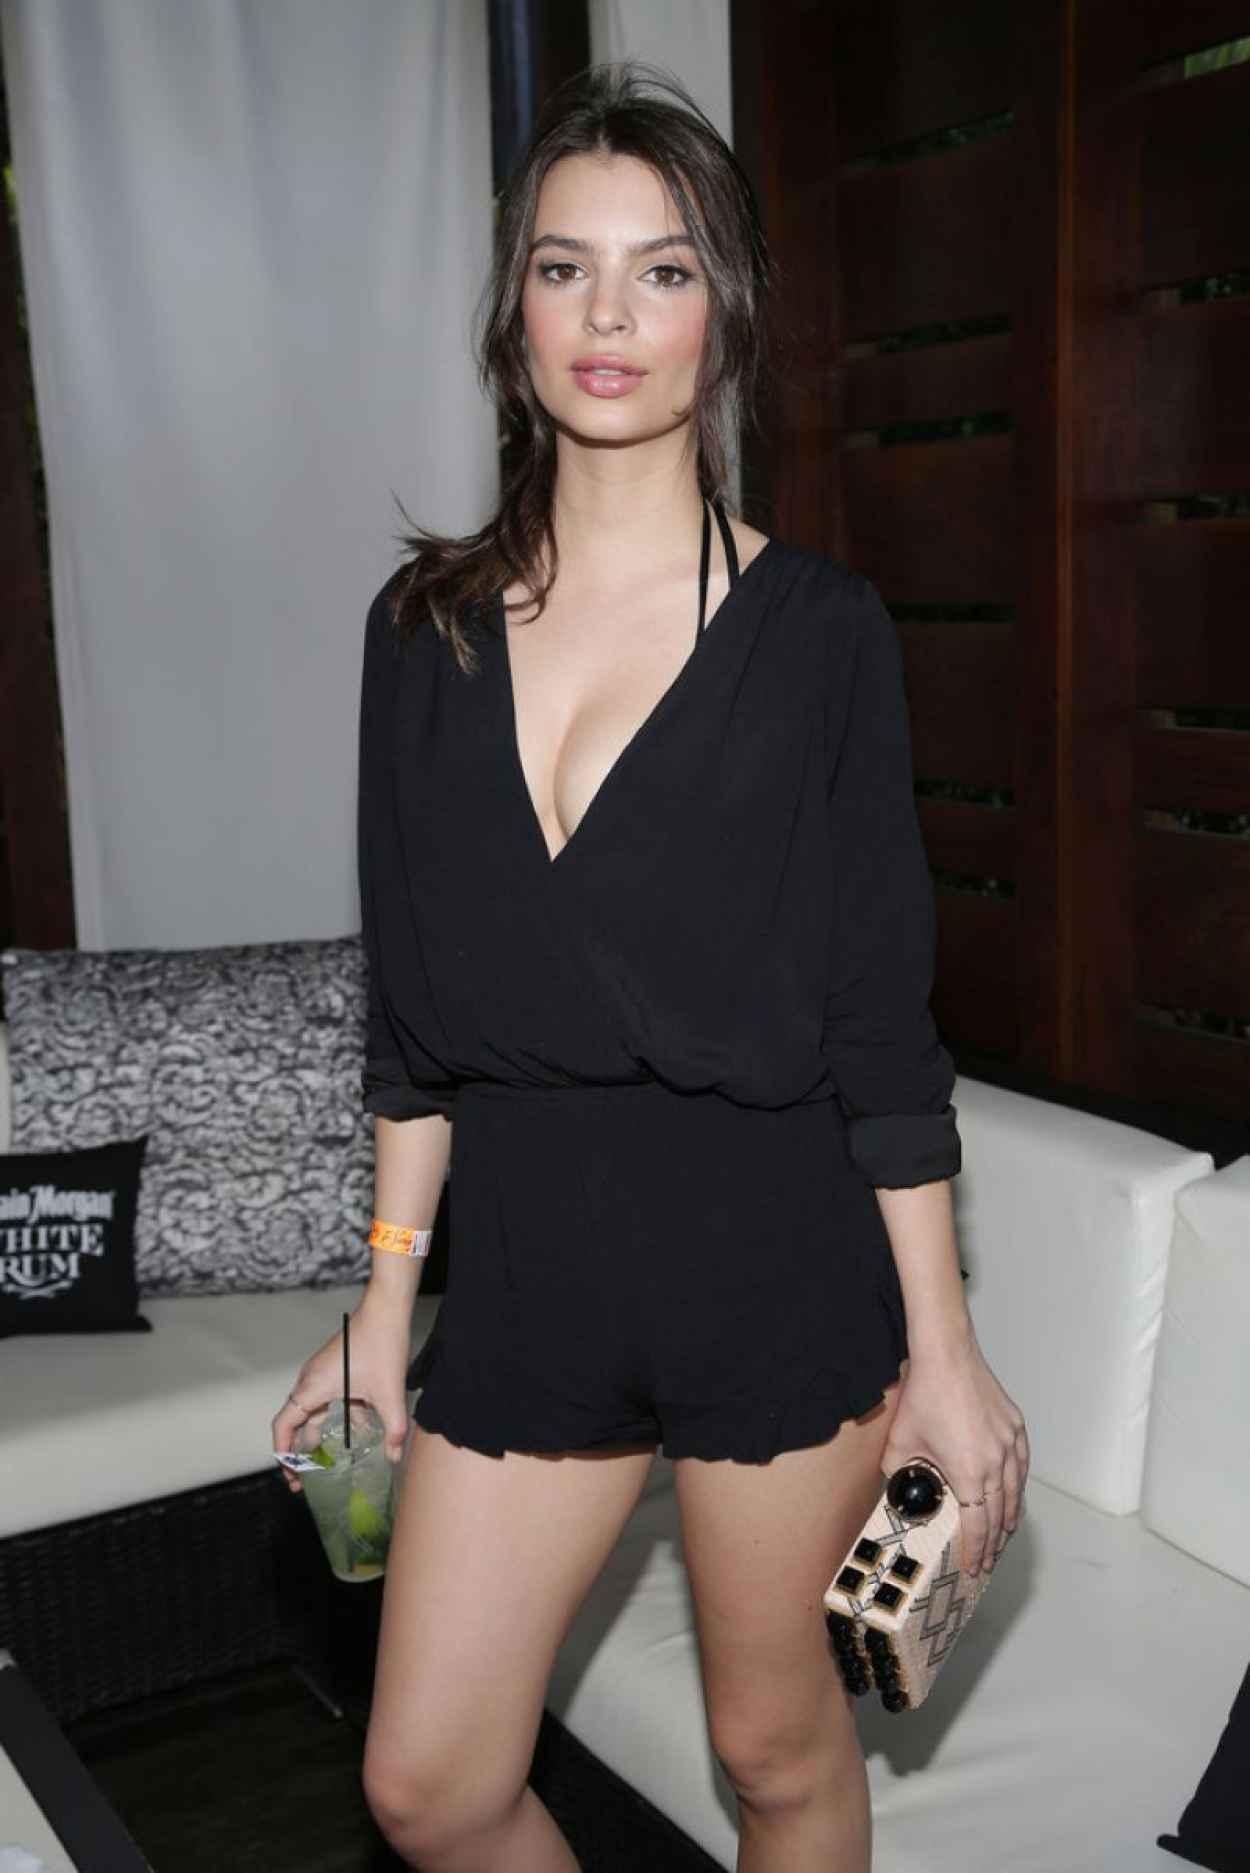 Emily Ratajkowski - Captain Morgan Celebrates SI Swimsuit-s 50th Anniversary in Miami (2014)-1